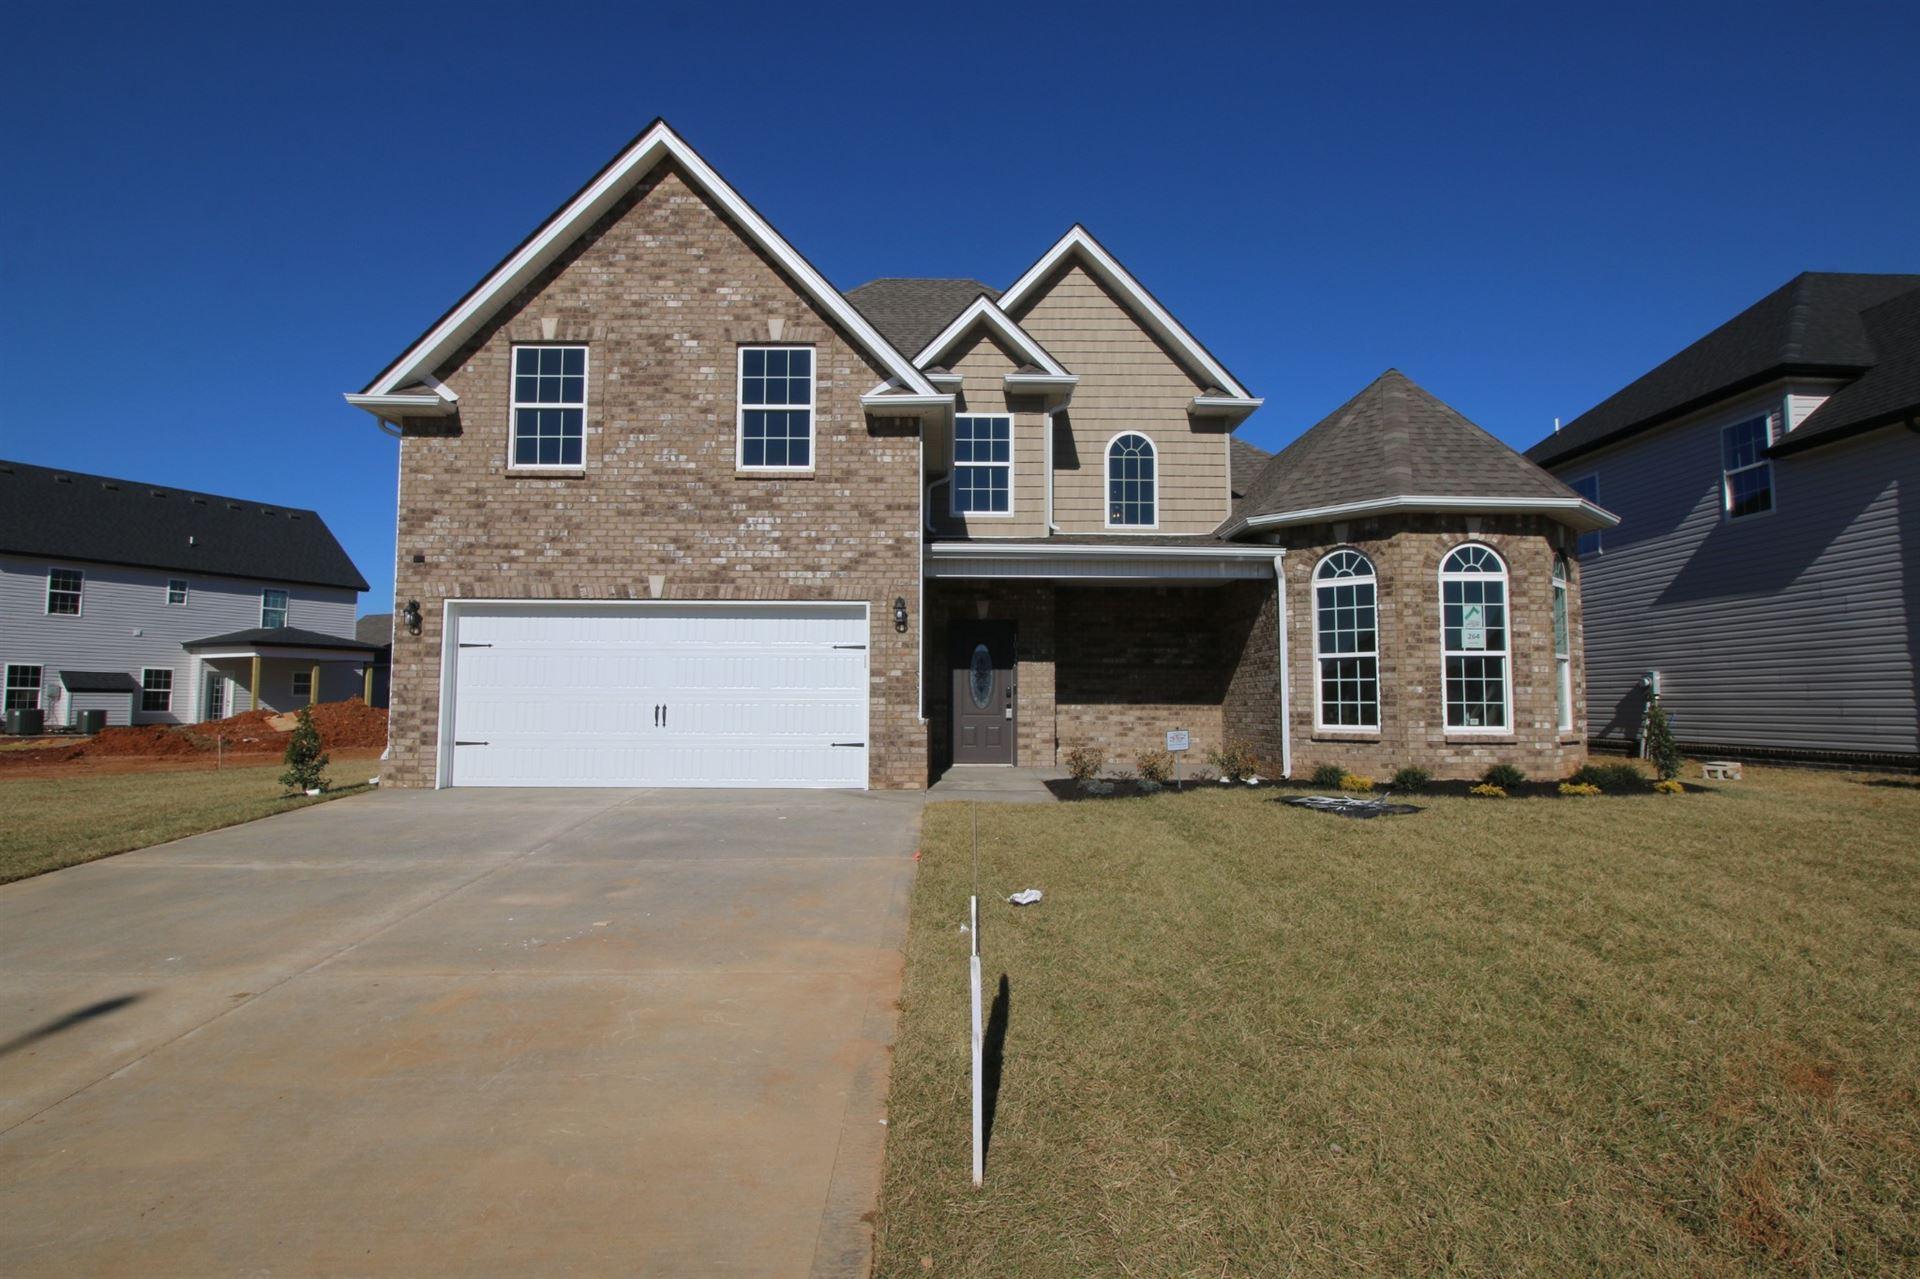 264 Mills Creek, Clarksville, TN 37042 - MLS#: 2292846